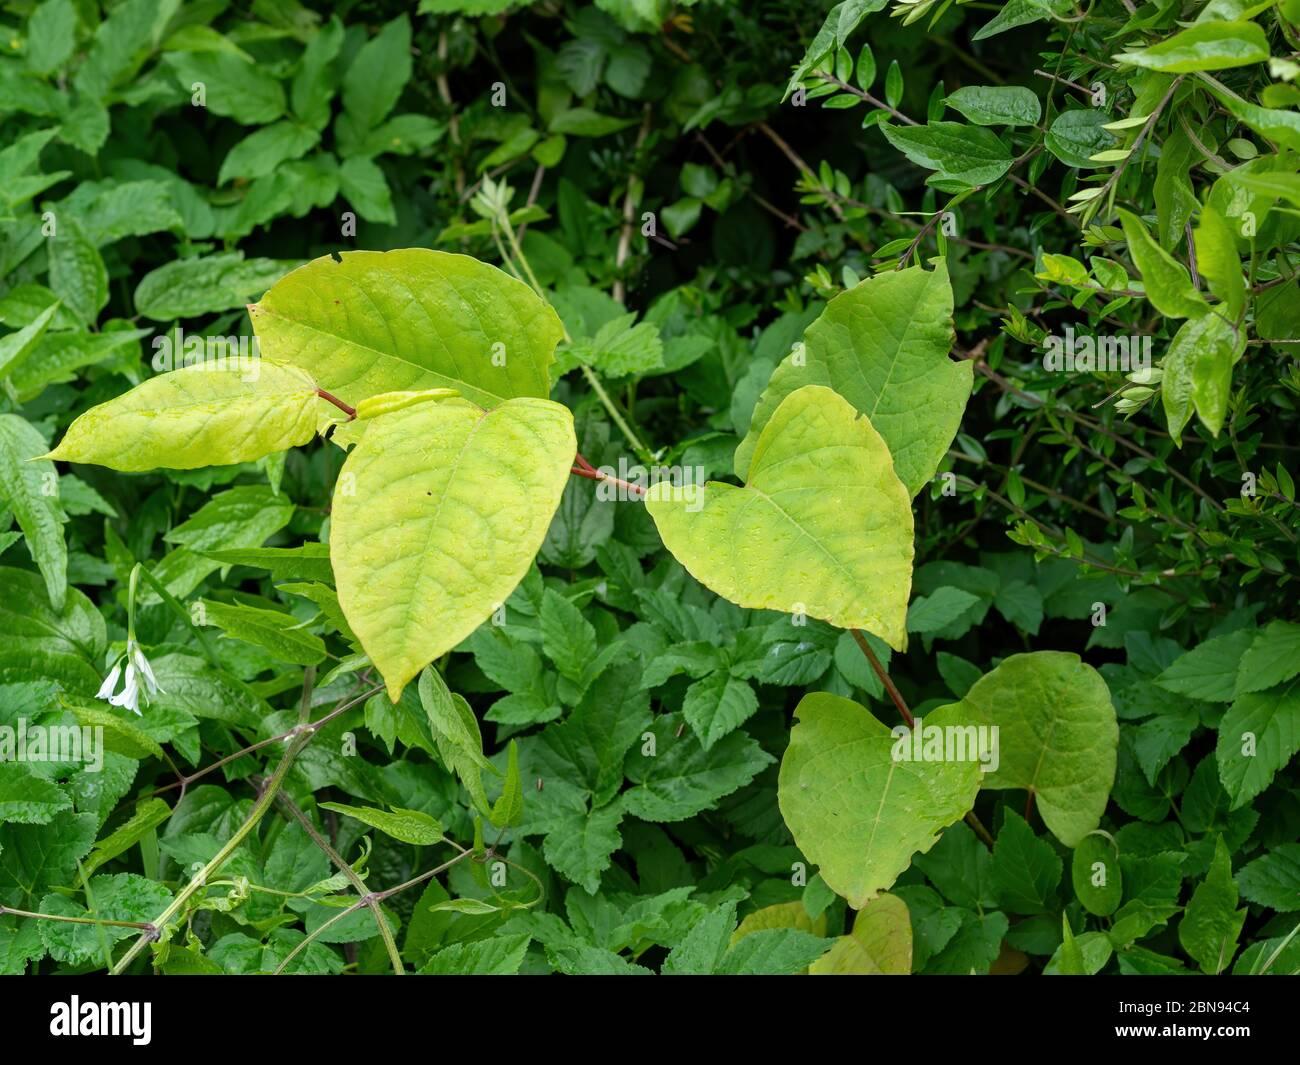 Japanese knotweed, invasive plant aka Reynoutria japonica, Fallopia japonica and Polygonum cuspidatum. UK. Spring shoots. Stock Photo